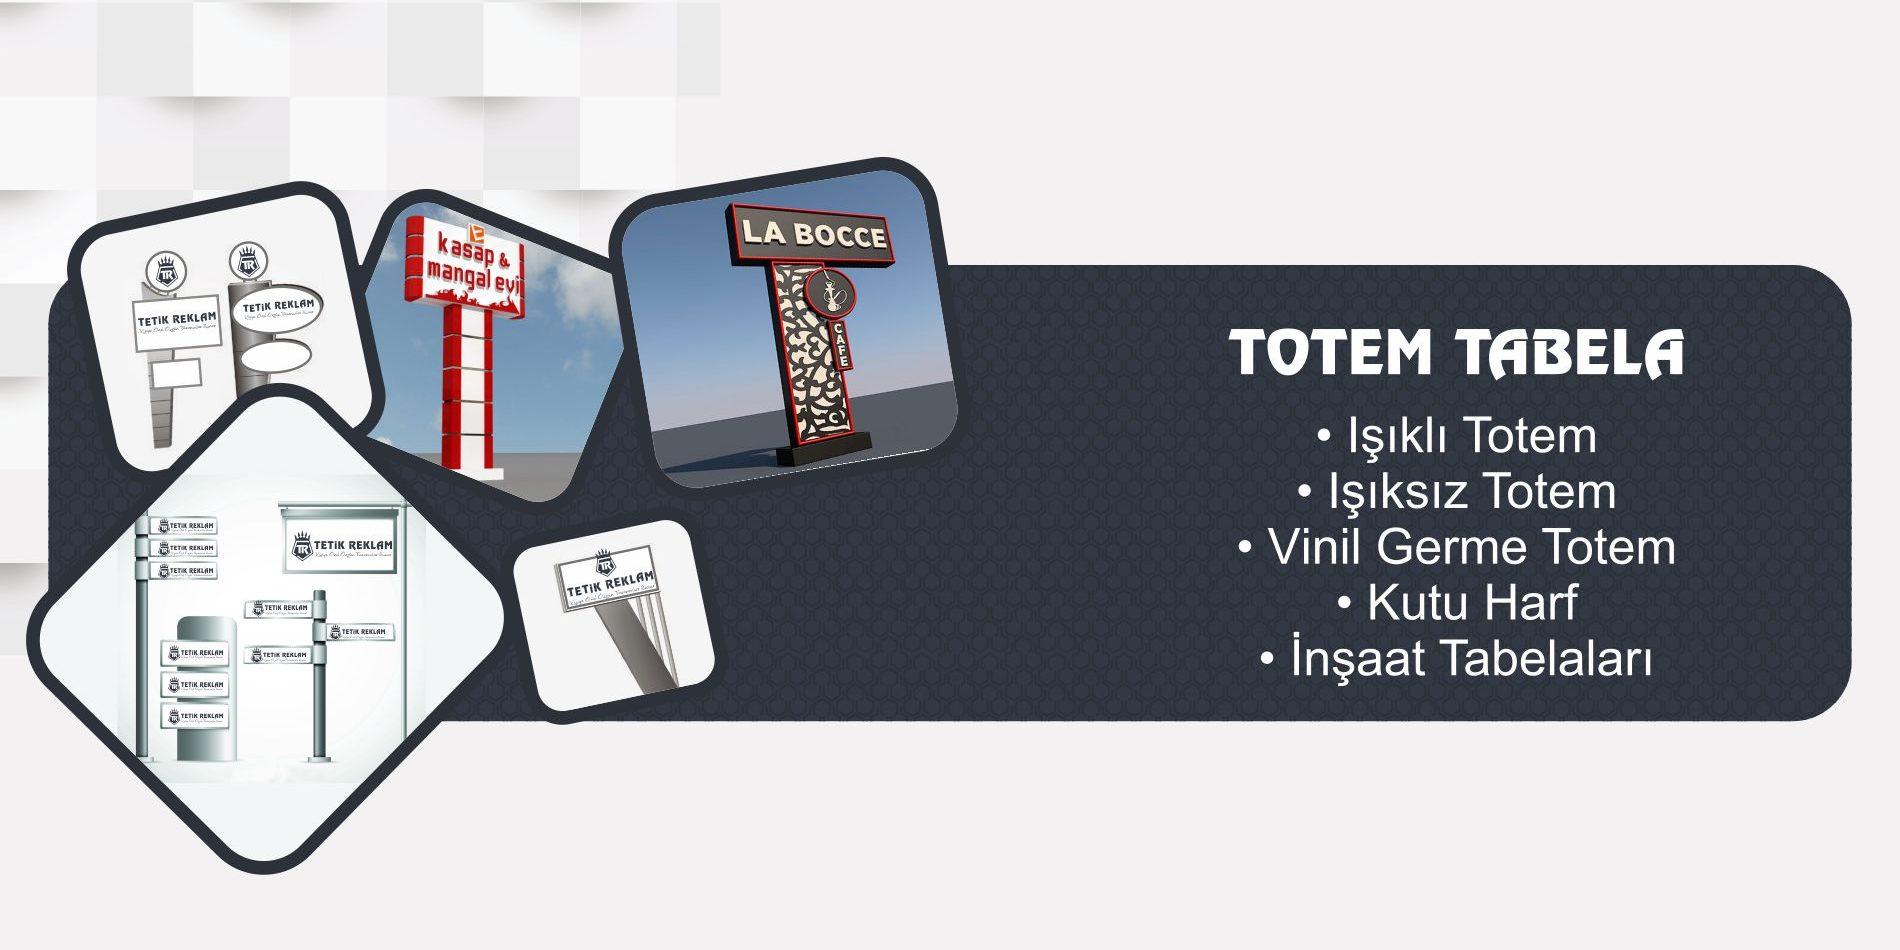 ankara totem tabela, totem tabela fiyatları, ışıklı totem tabela çeşitleri, totem tabela nedir, tetik reklam ankara